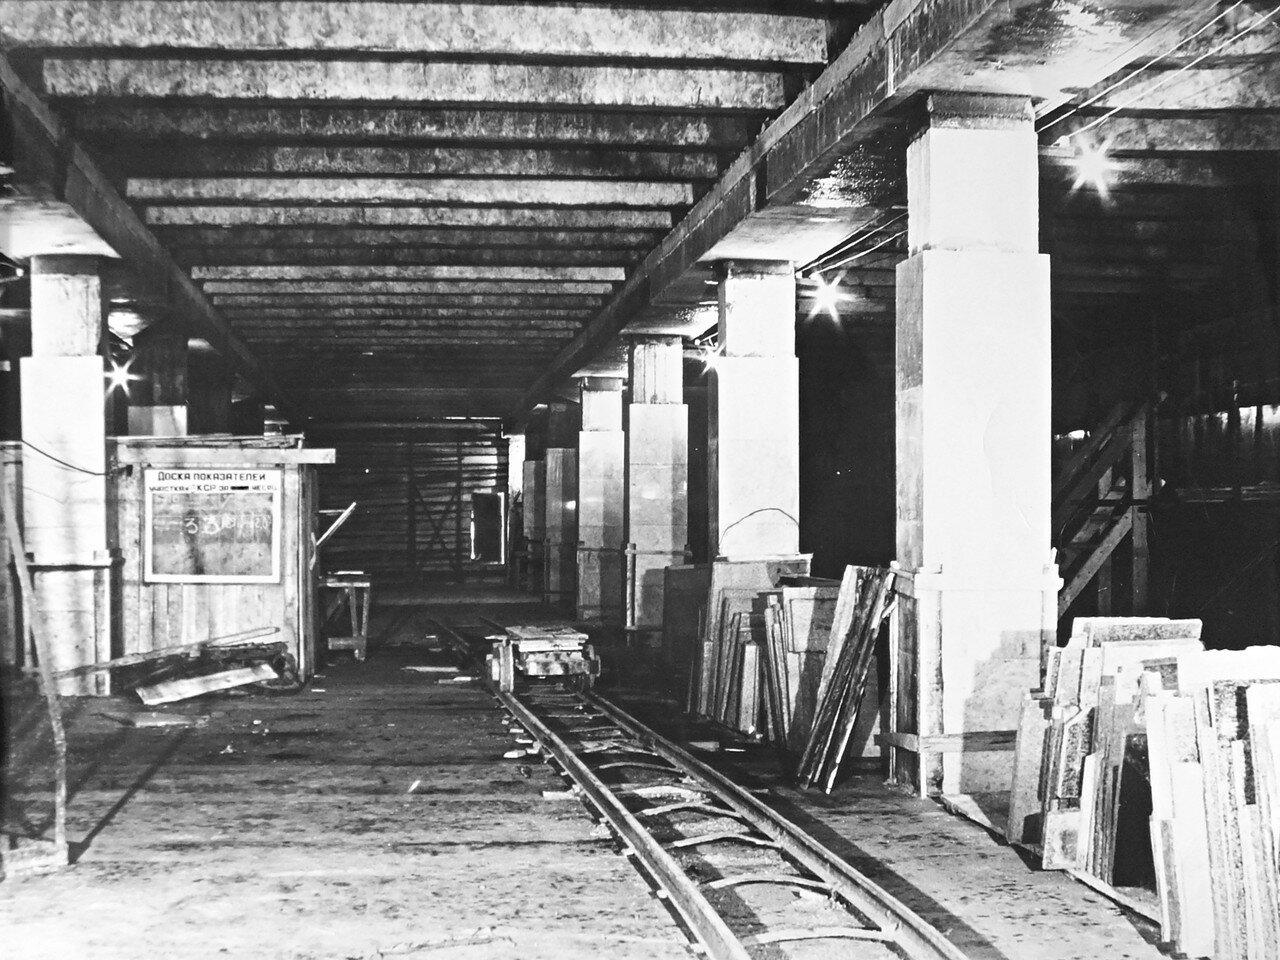 1978. Строительство станции метро Новогиреево